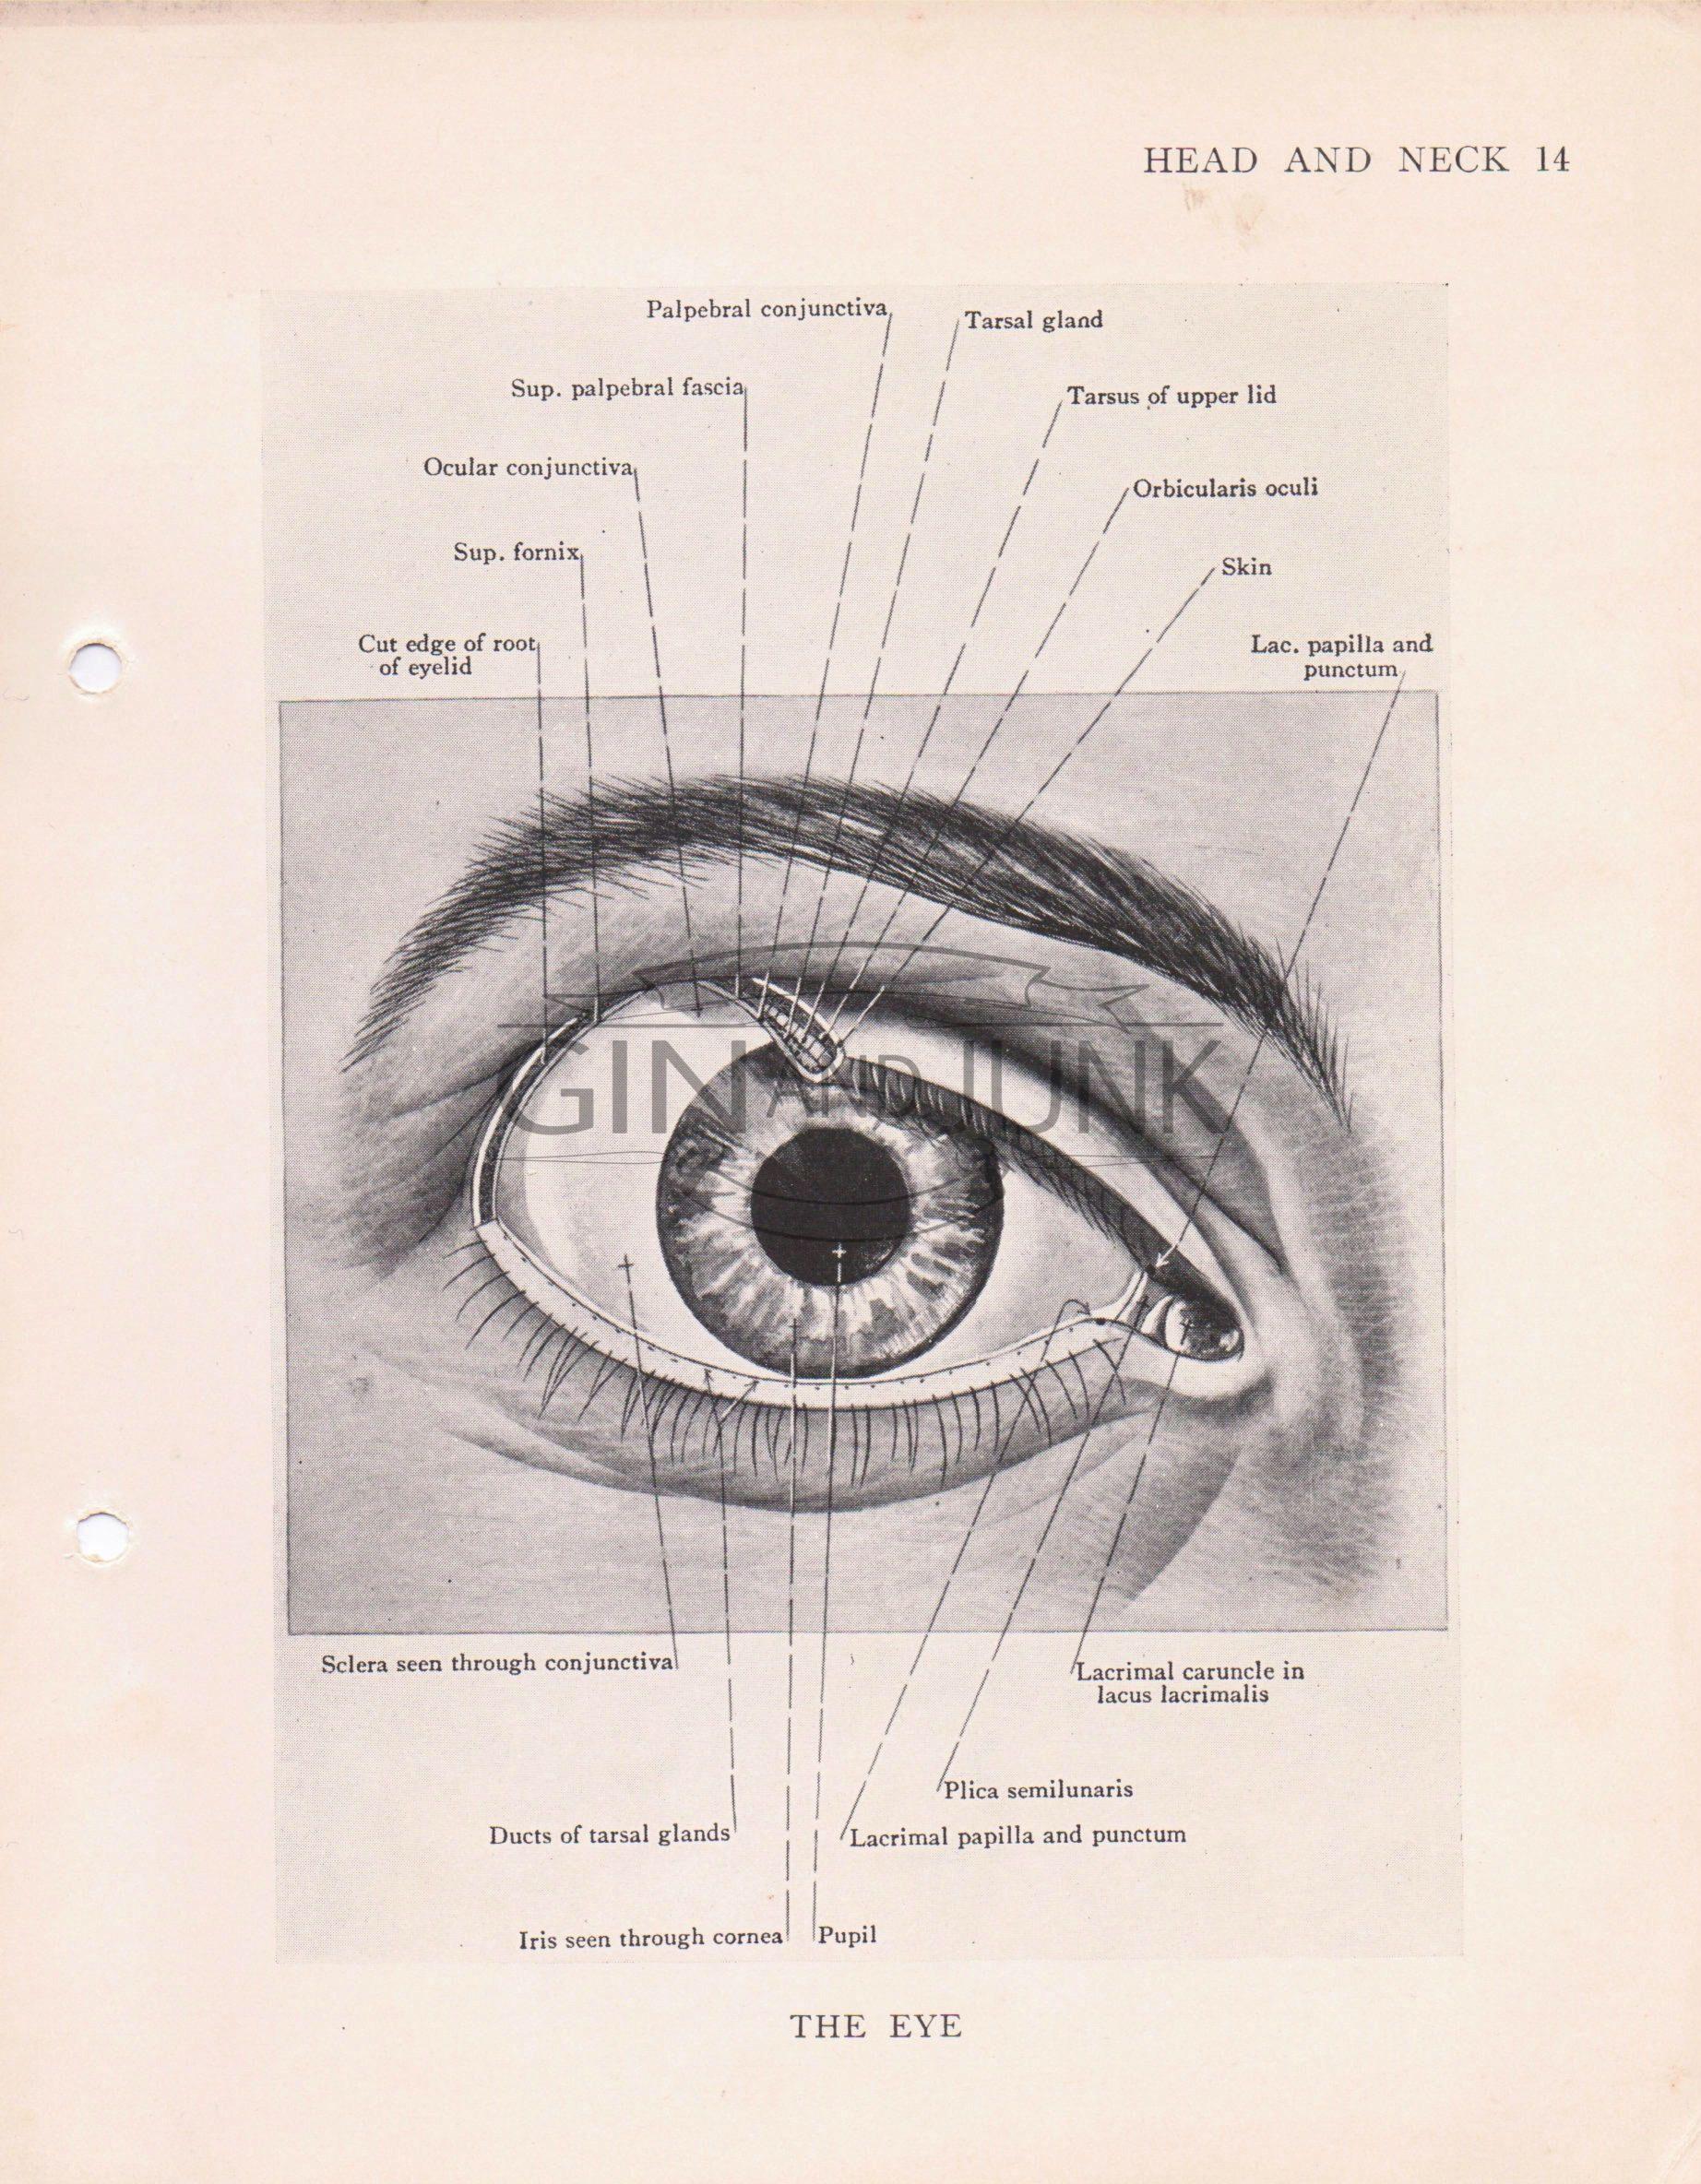 Pin by GinAndJunk on Anatomy Prints | Pinterest | Optician